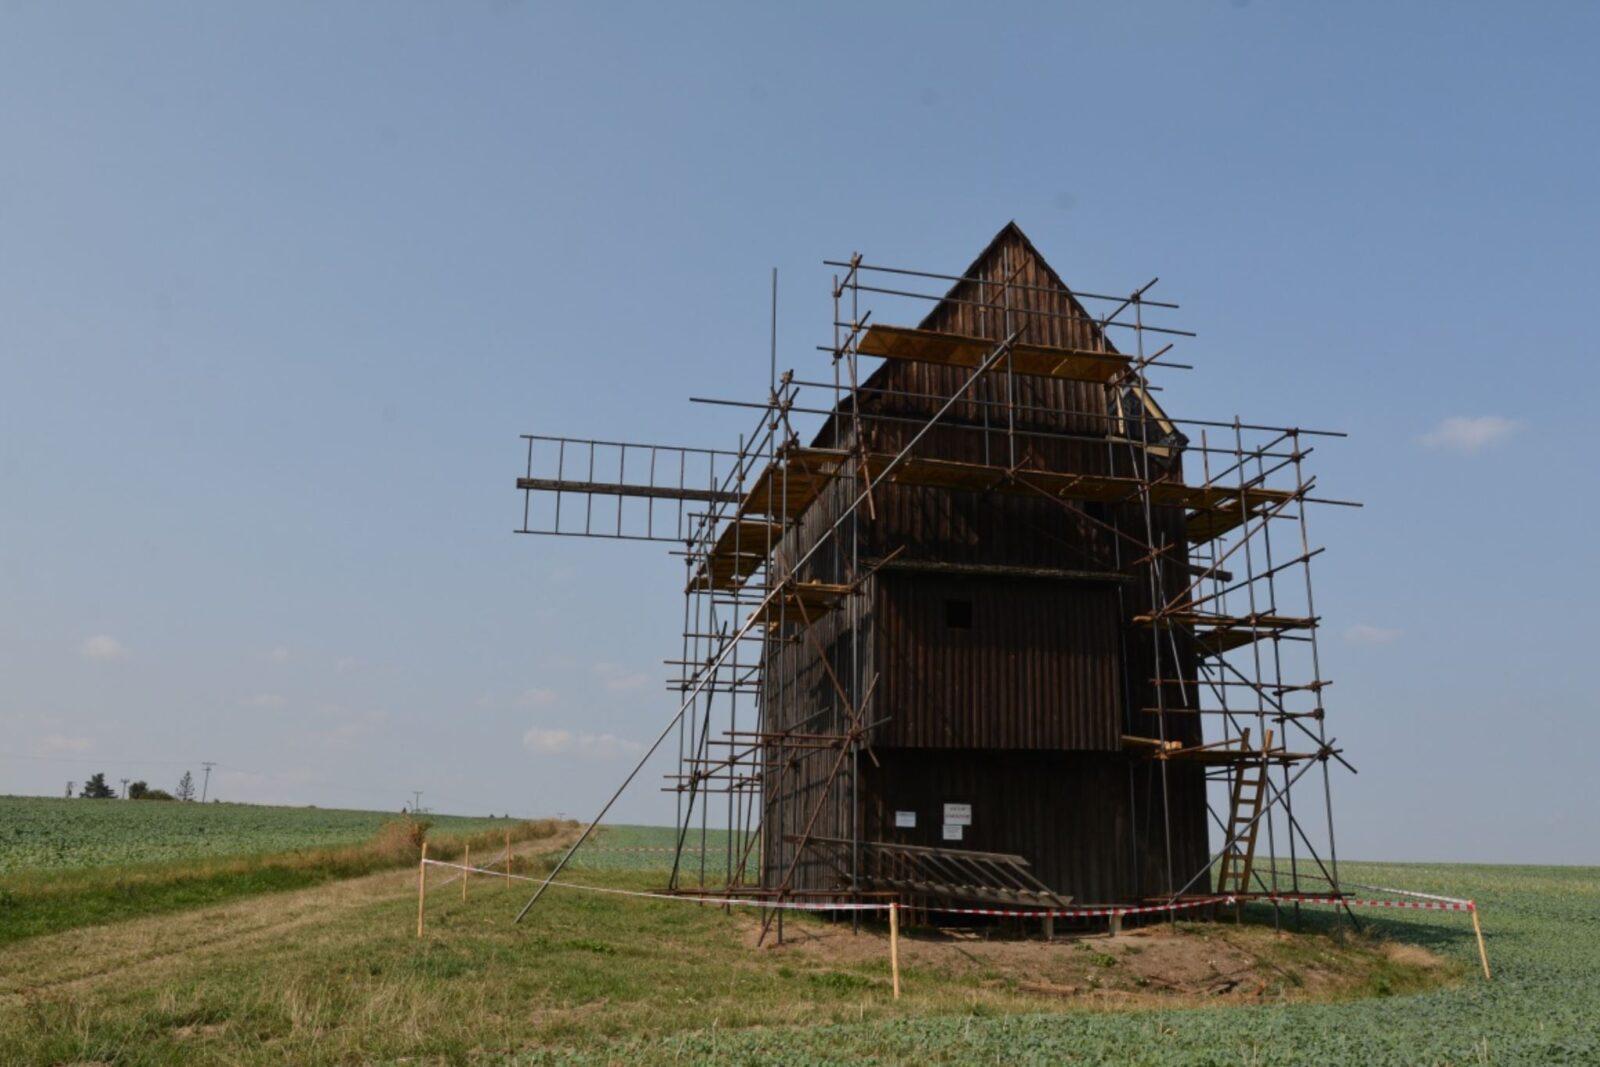 Větrný mlýn Nové Dvory, 29. 8. 2018, zdroj: www.bilovec.cz